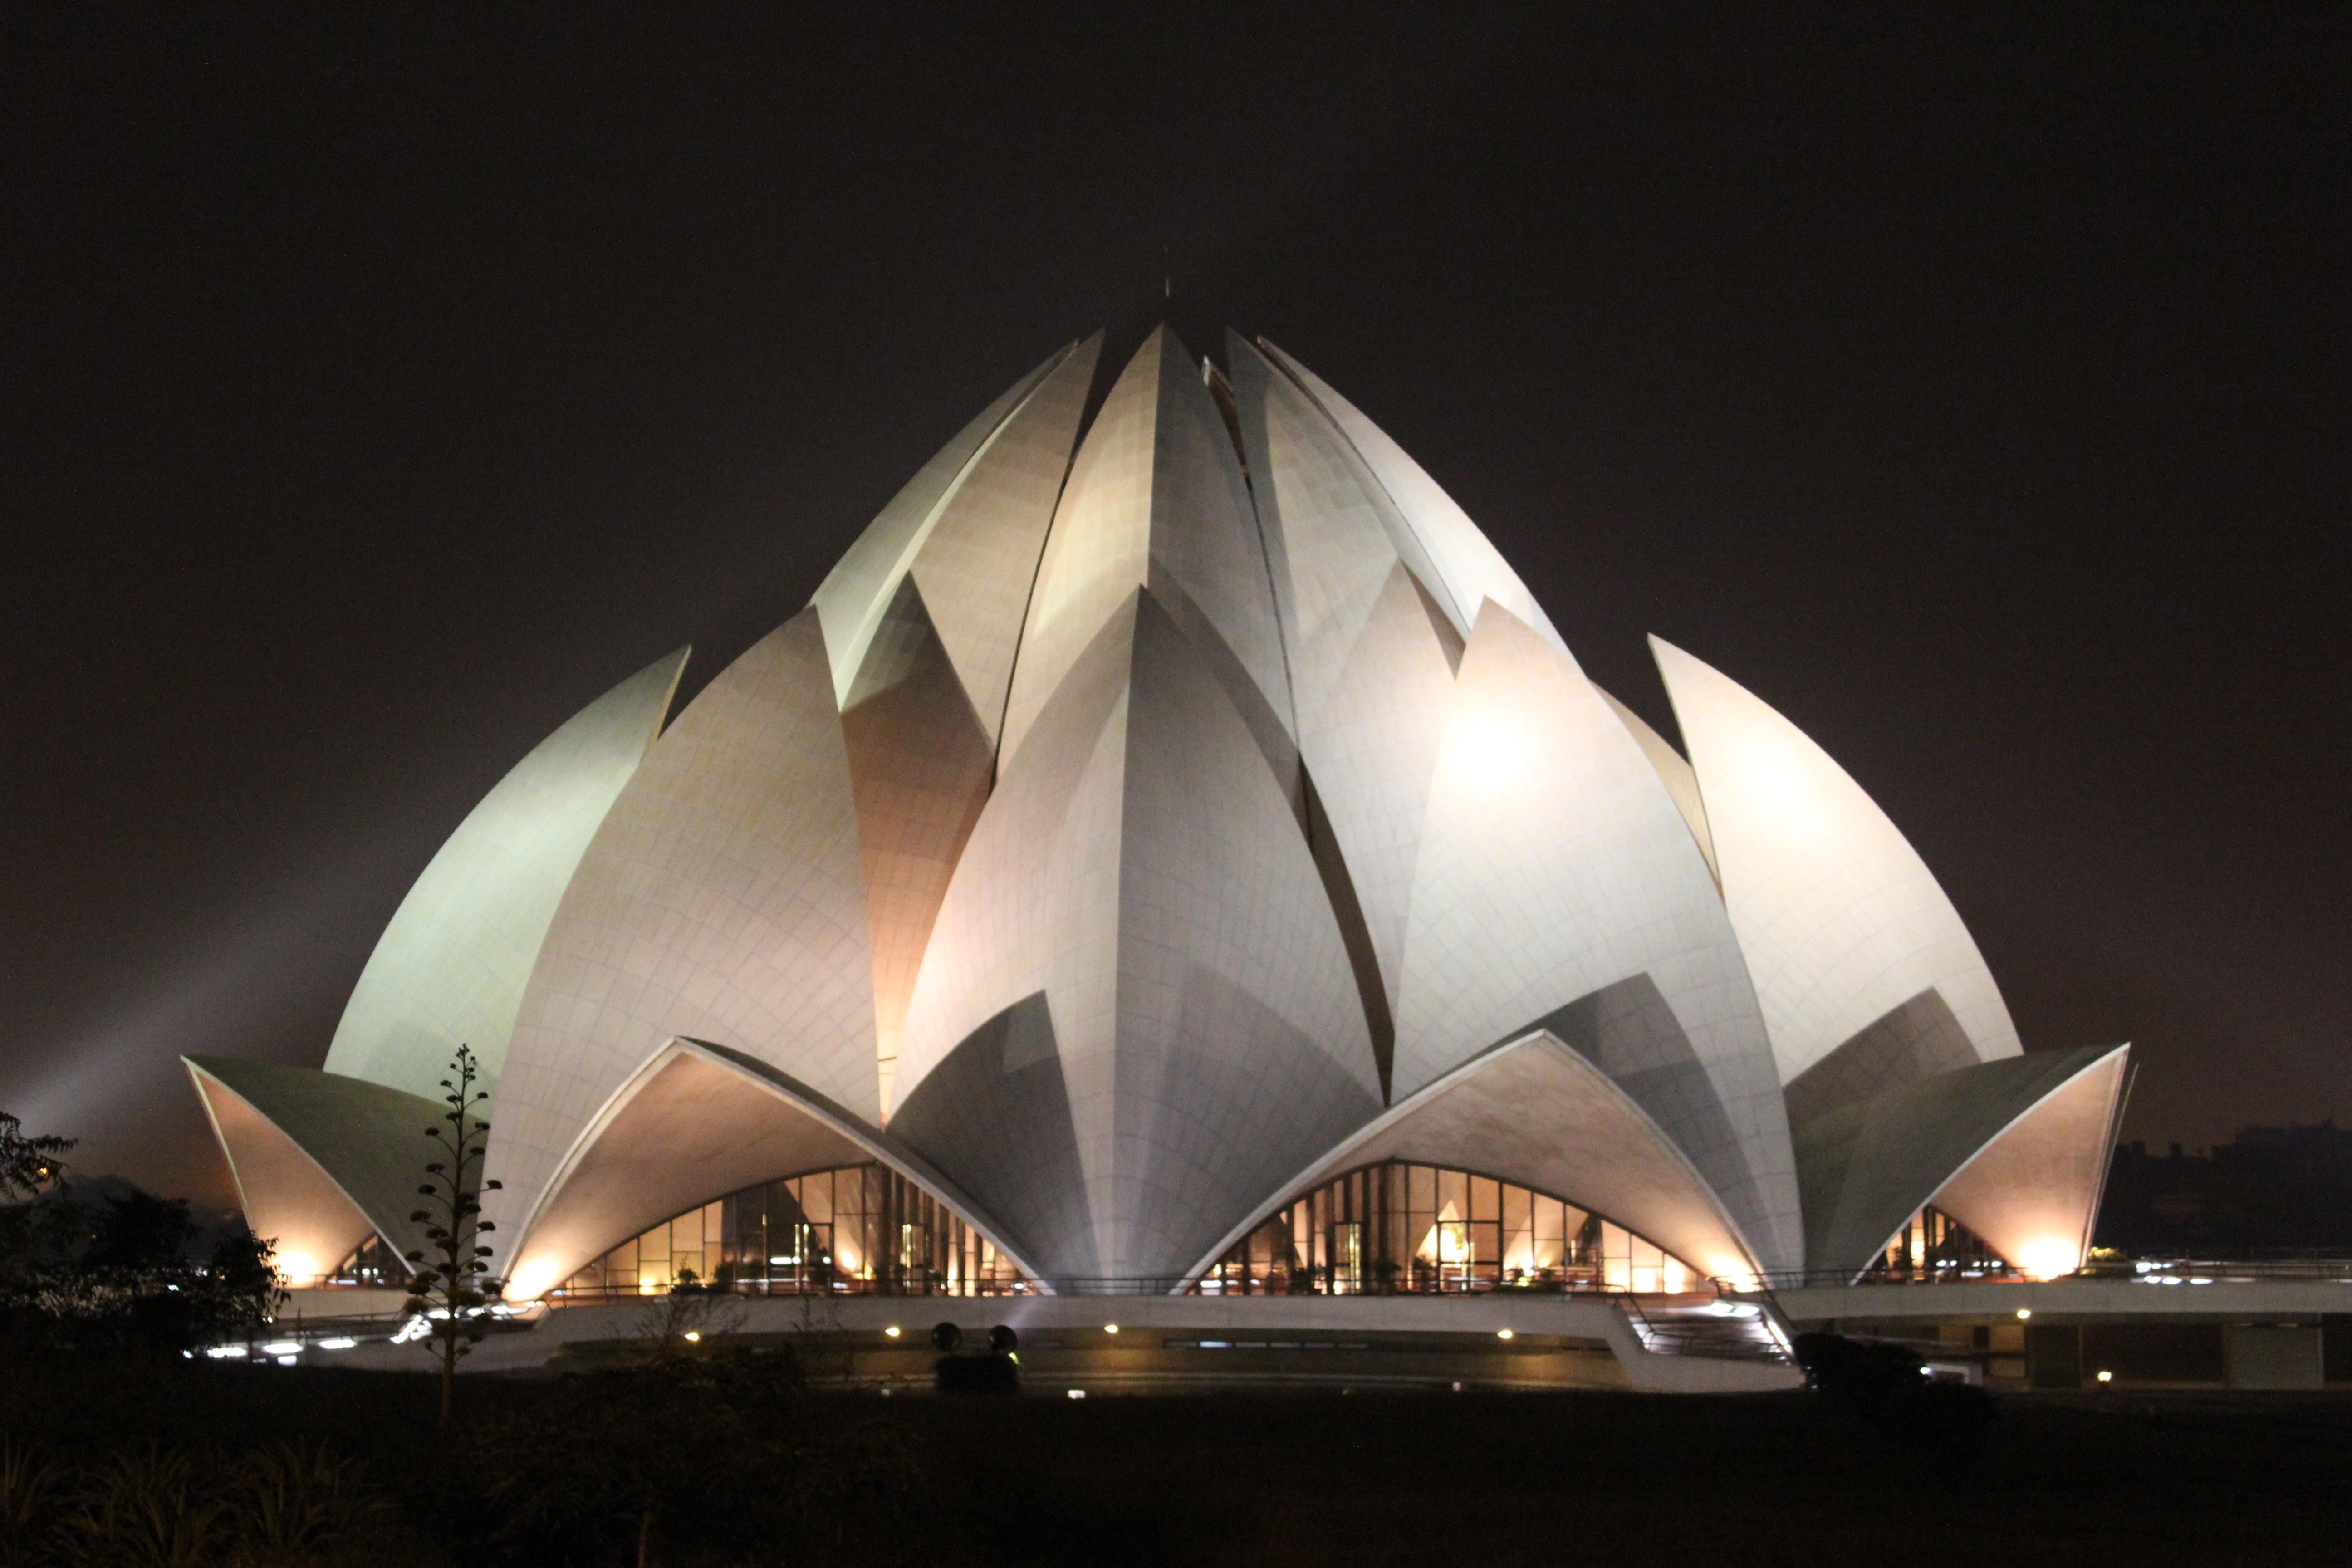 Lotus Temple in India: photos and description 17